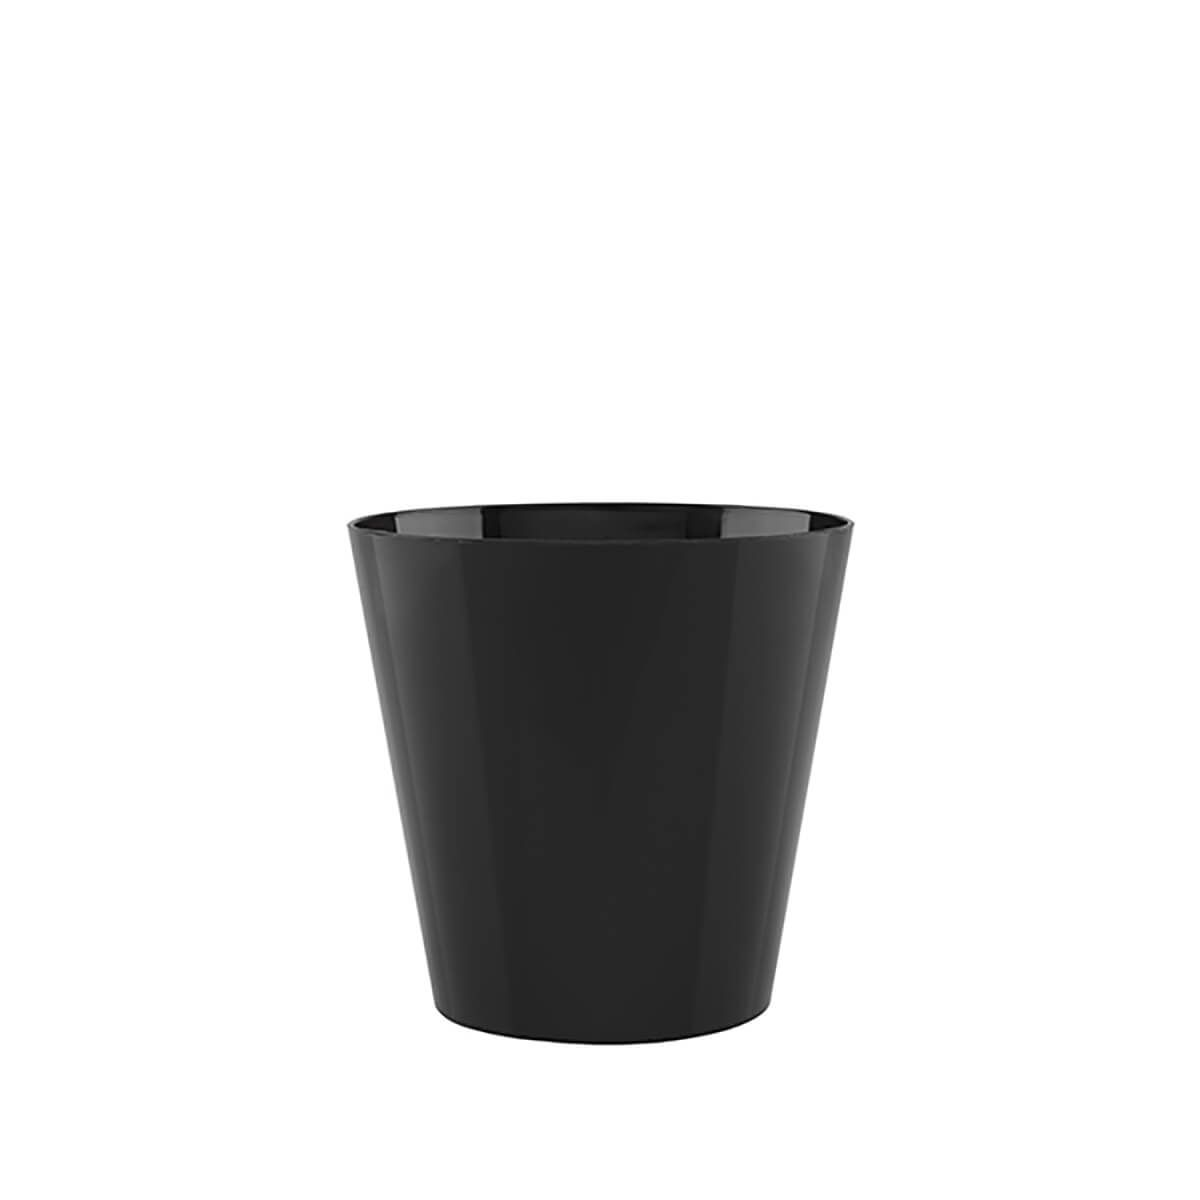 Vaso Porto 18 x 16 cm Preto Vasart